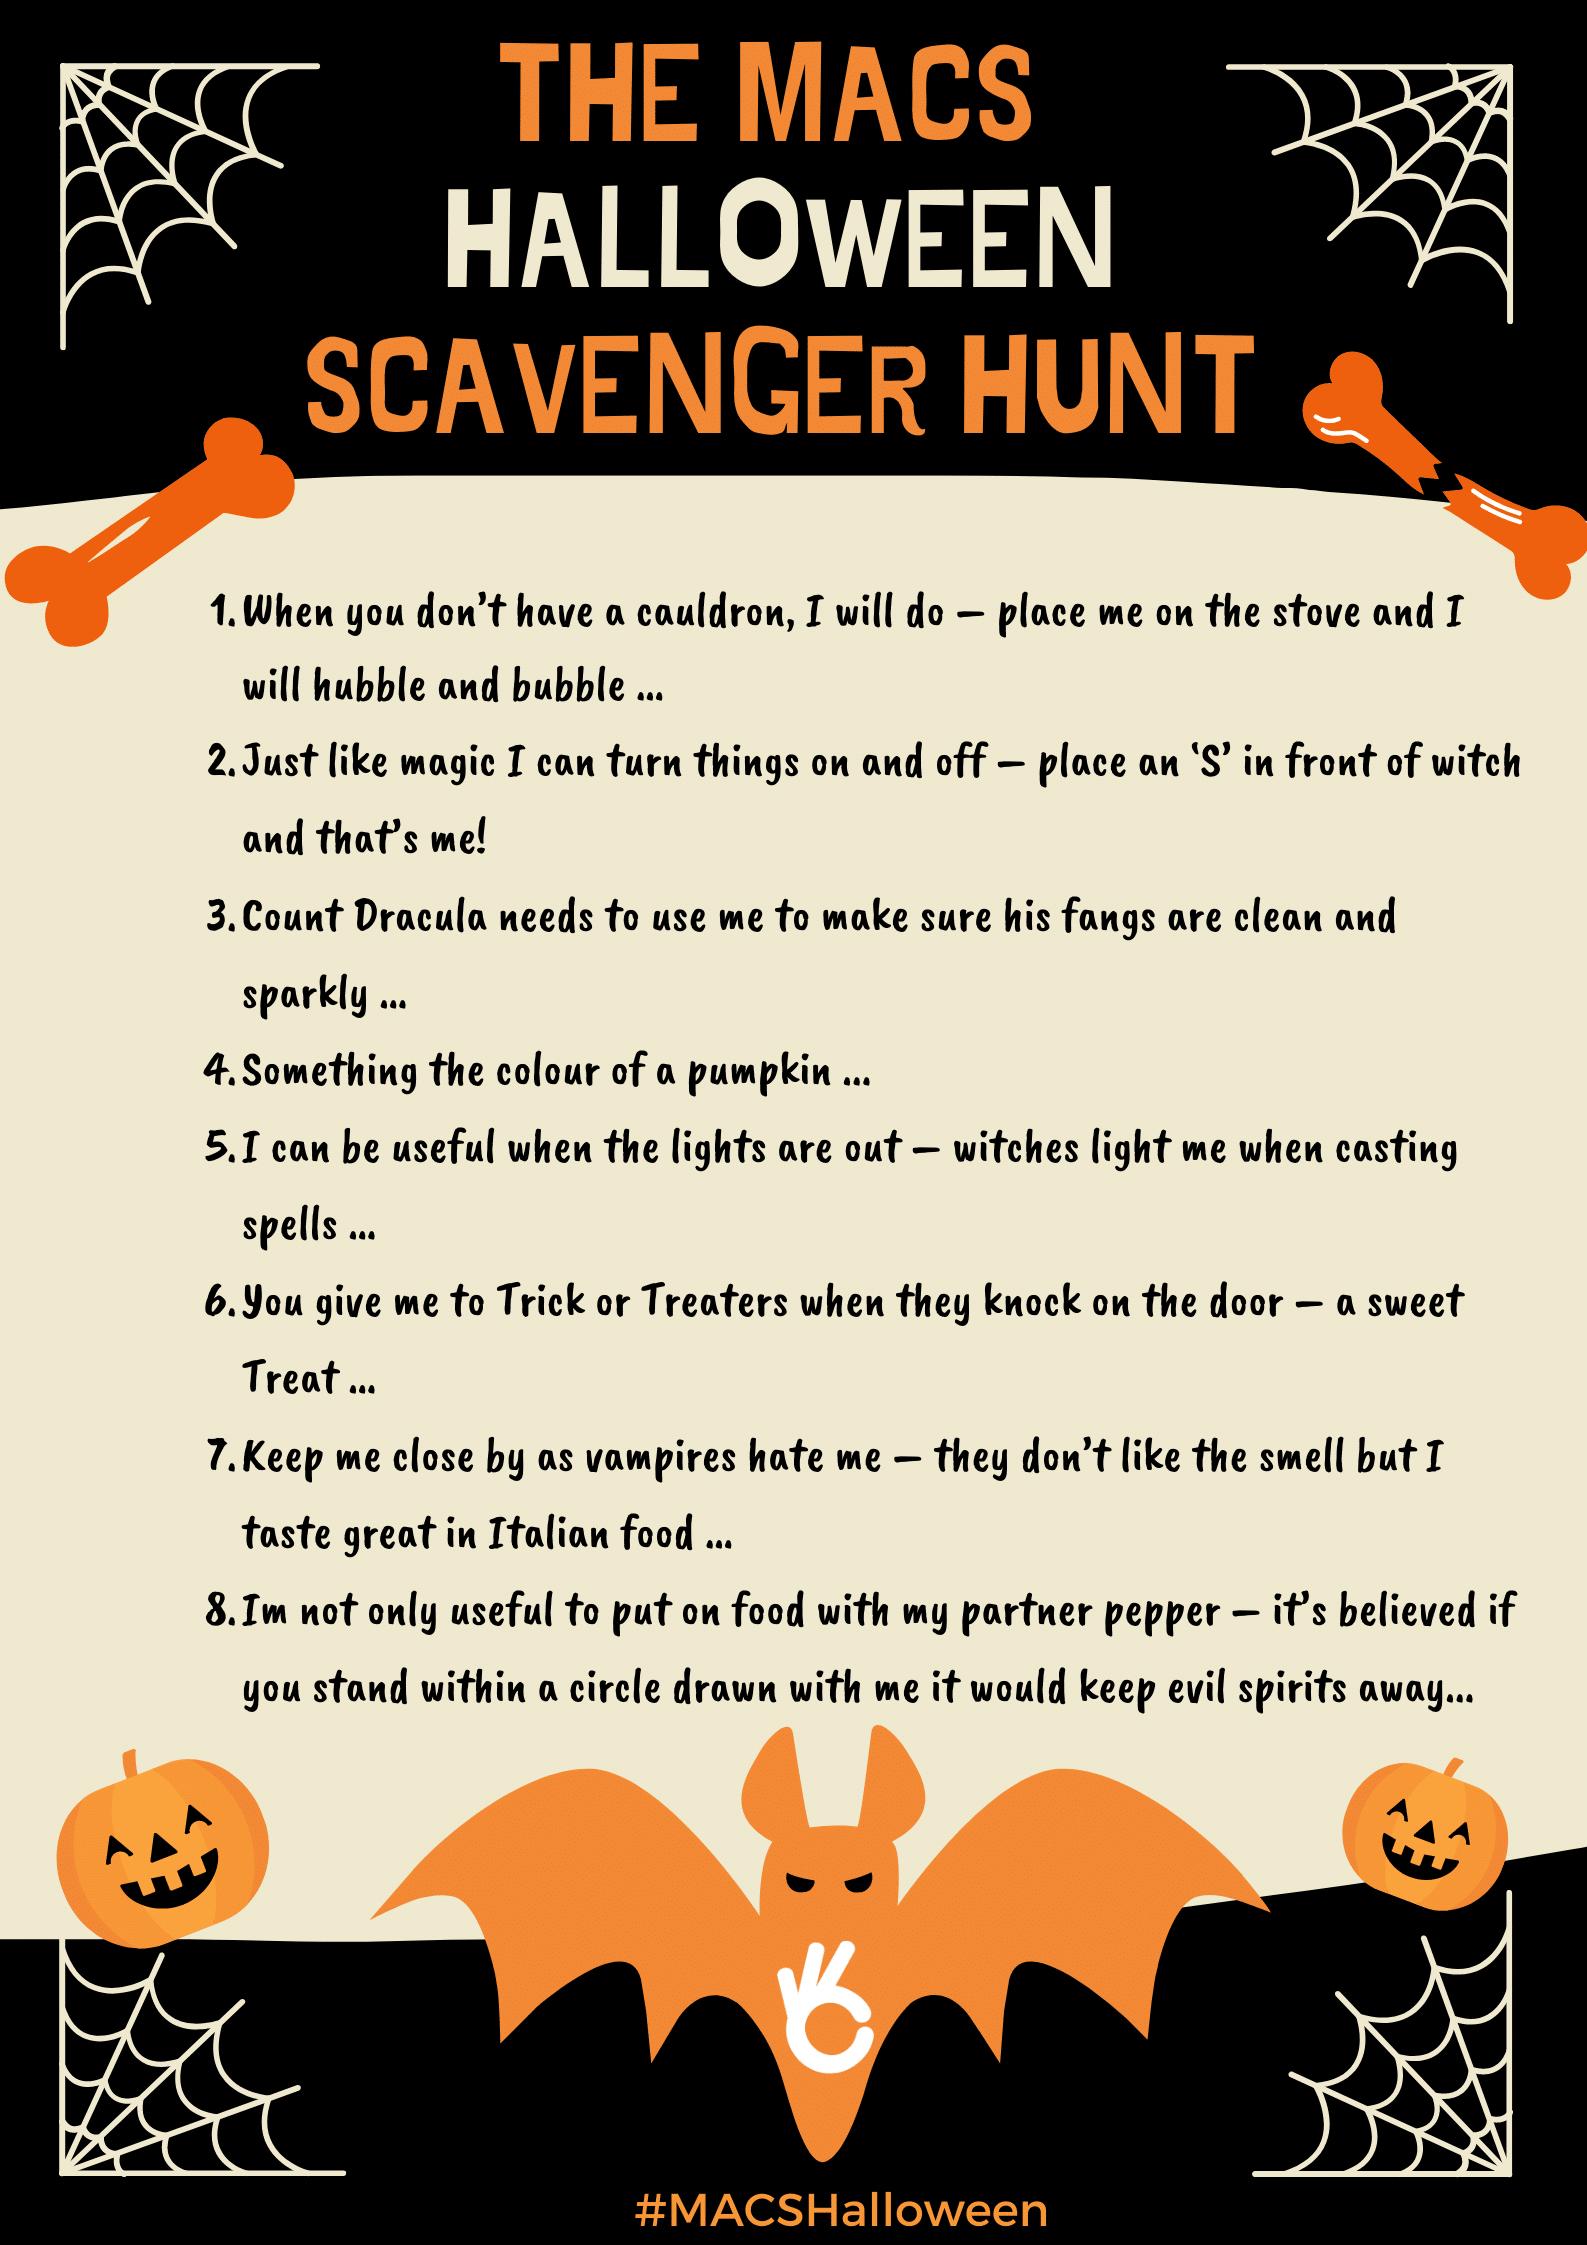 The Halloween Scavenger Hunt